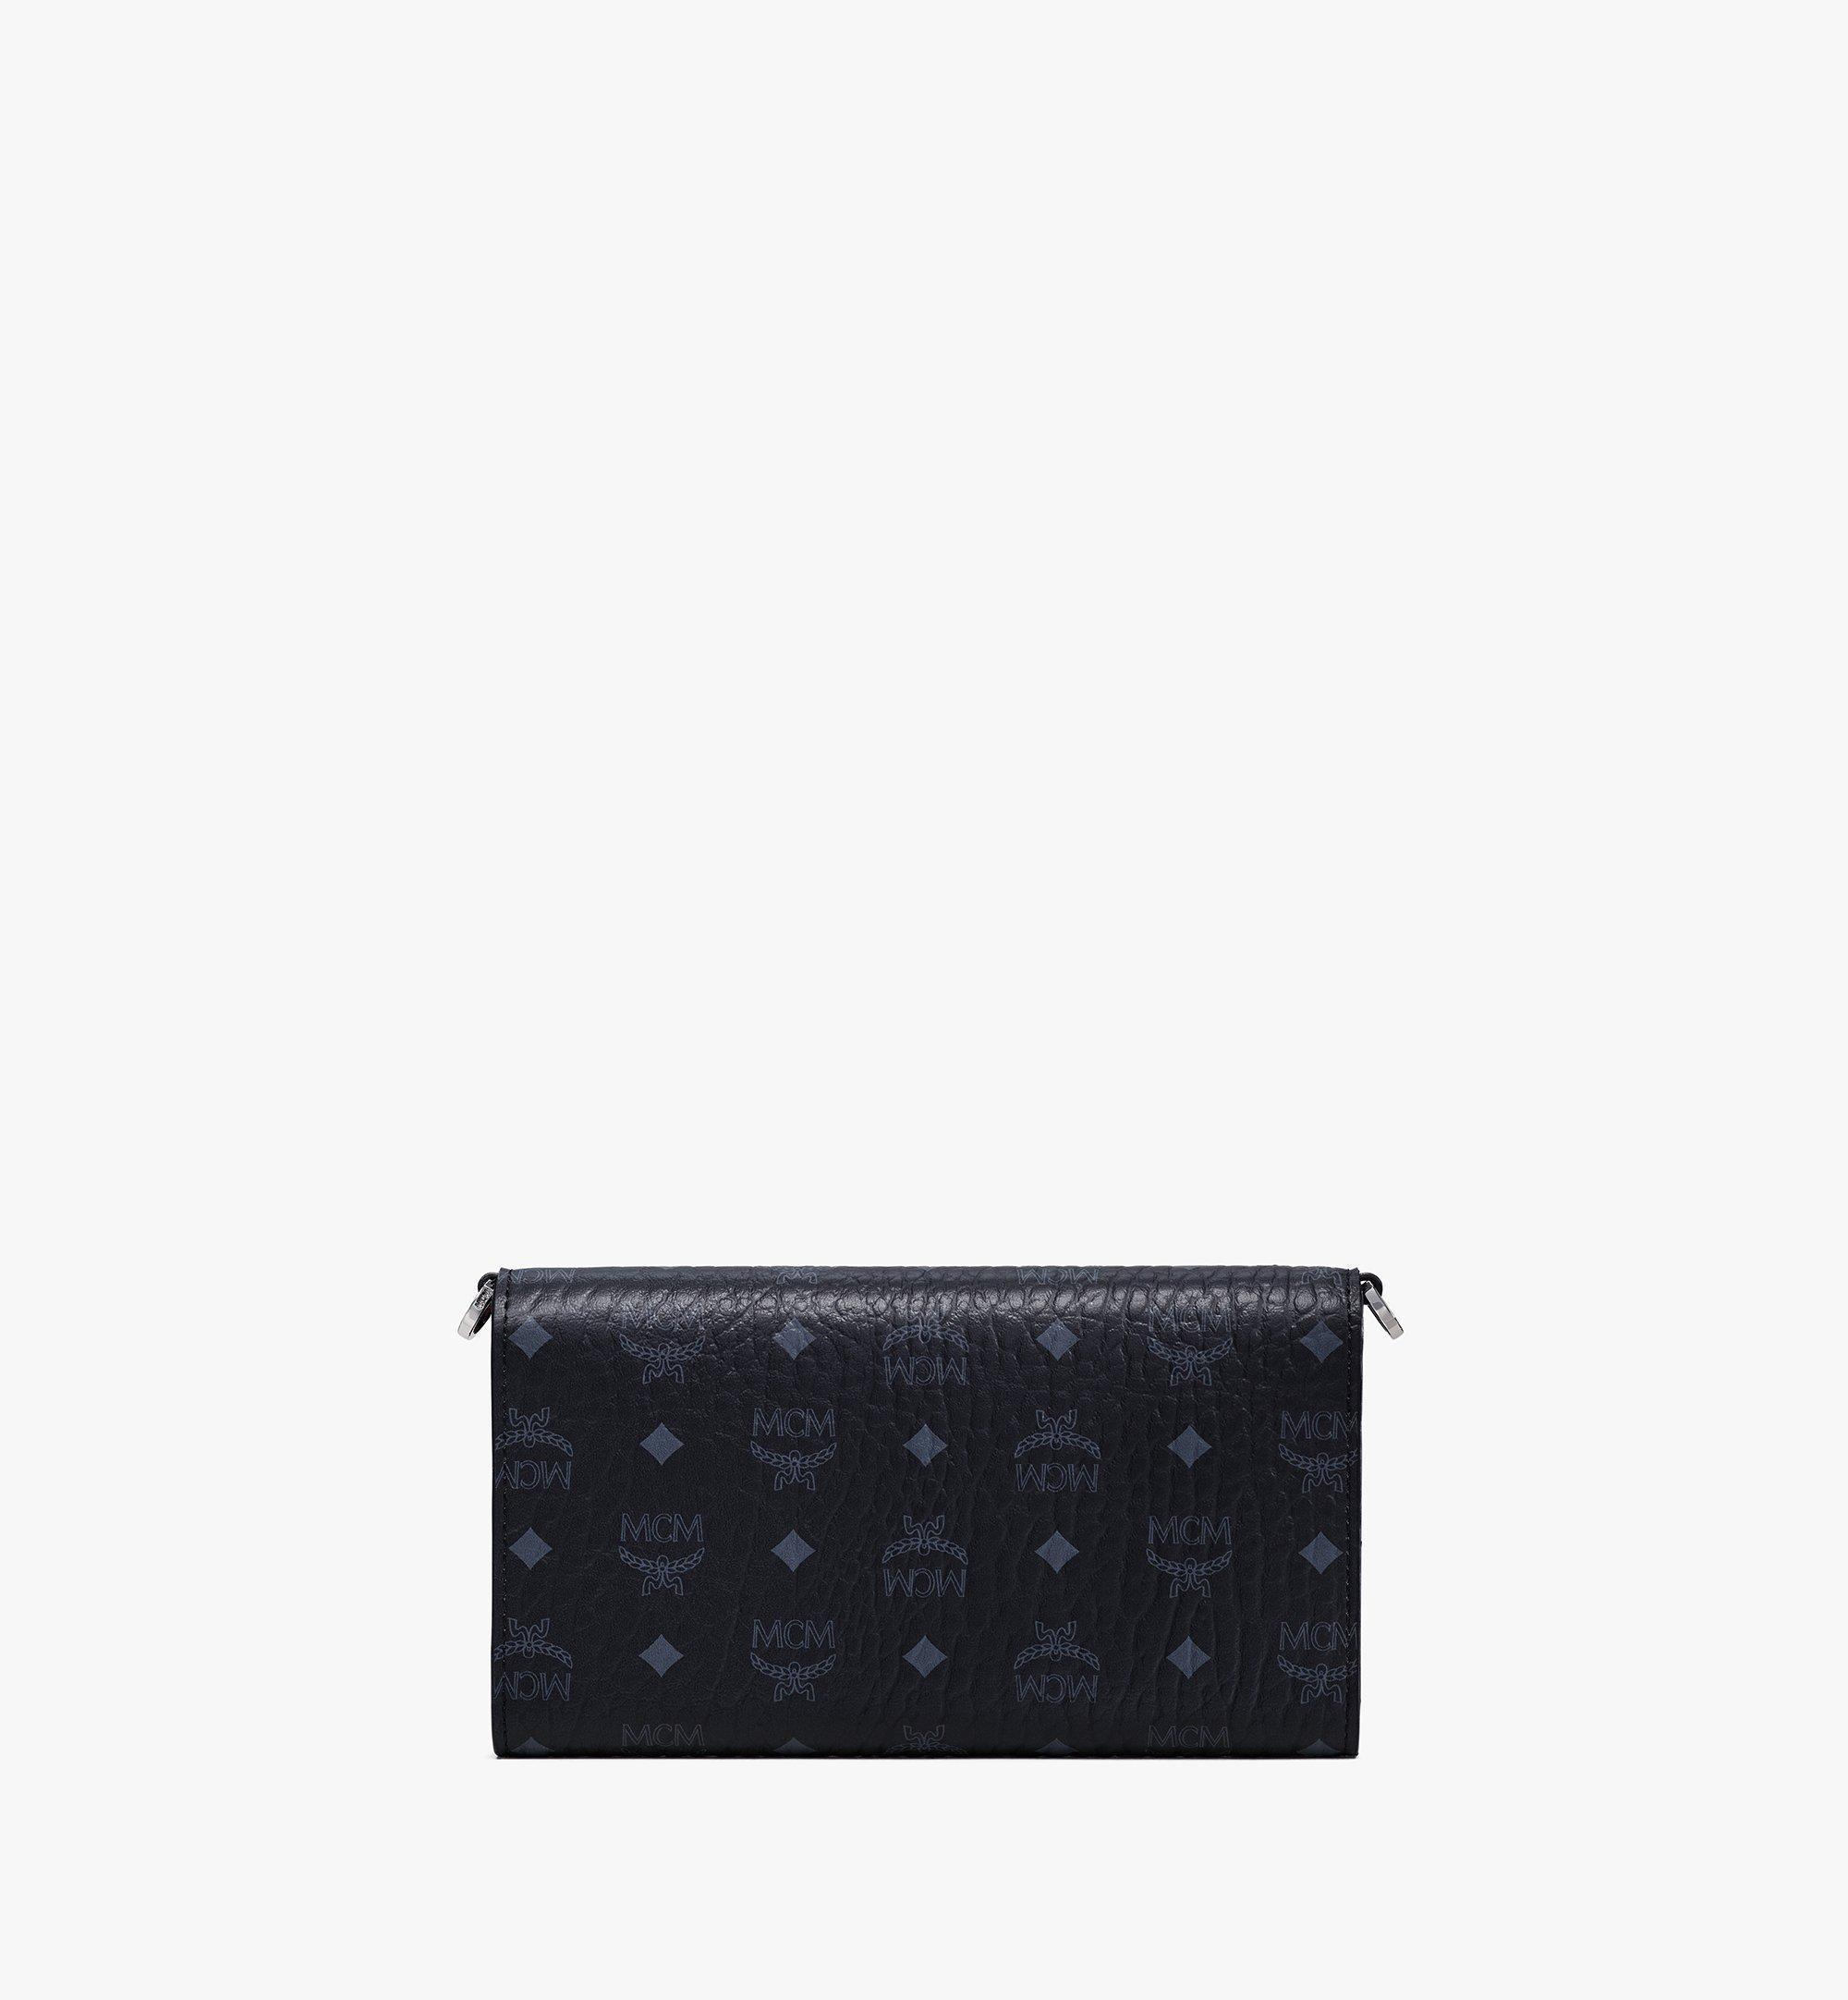 MCM กระเป๋าสตางค์ใส่โทรศัพท์มือถือครอสบอดี้ลาย Visetos Original Black MXEBSVI01BK001 มุมมองอื่น 2